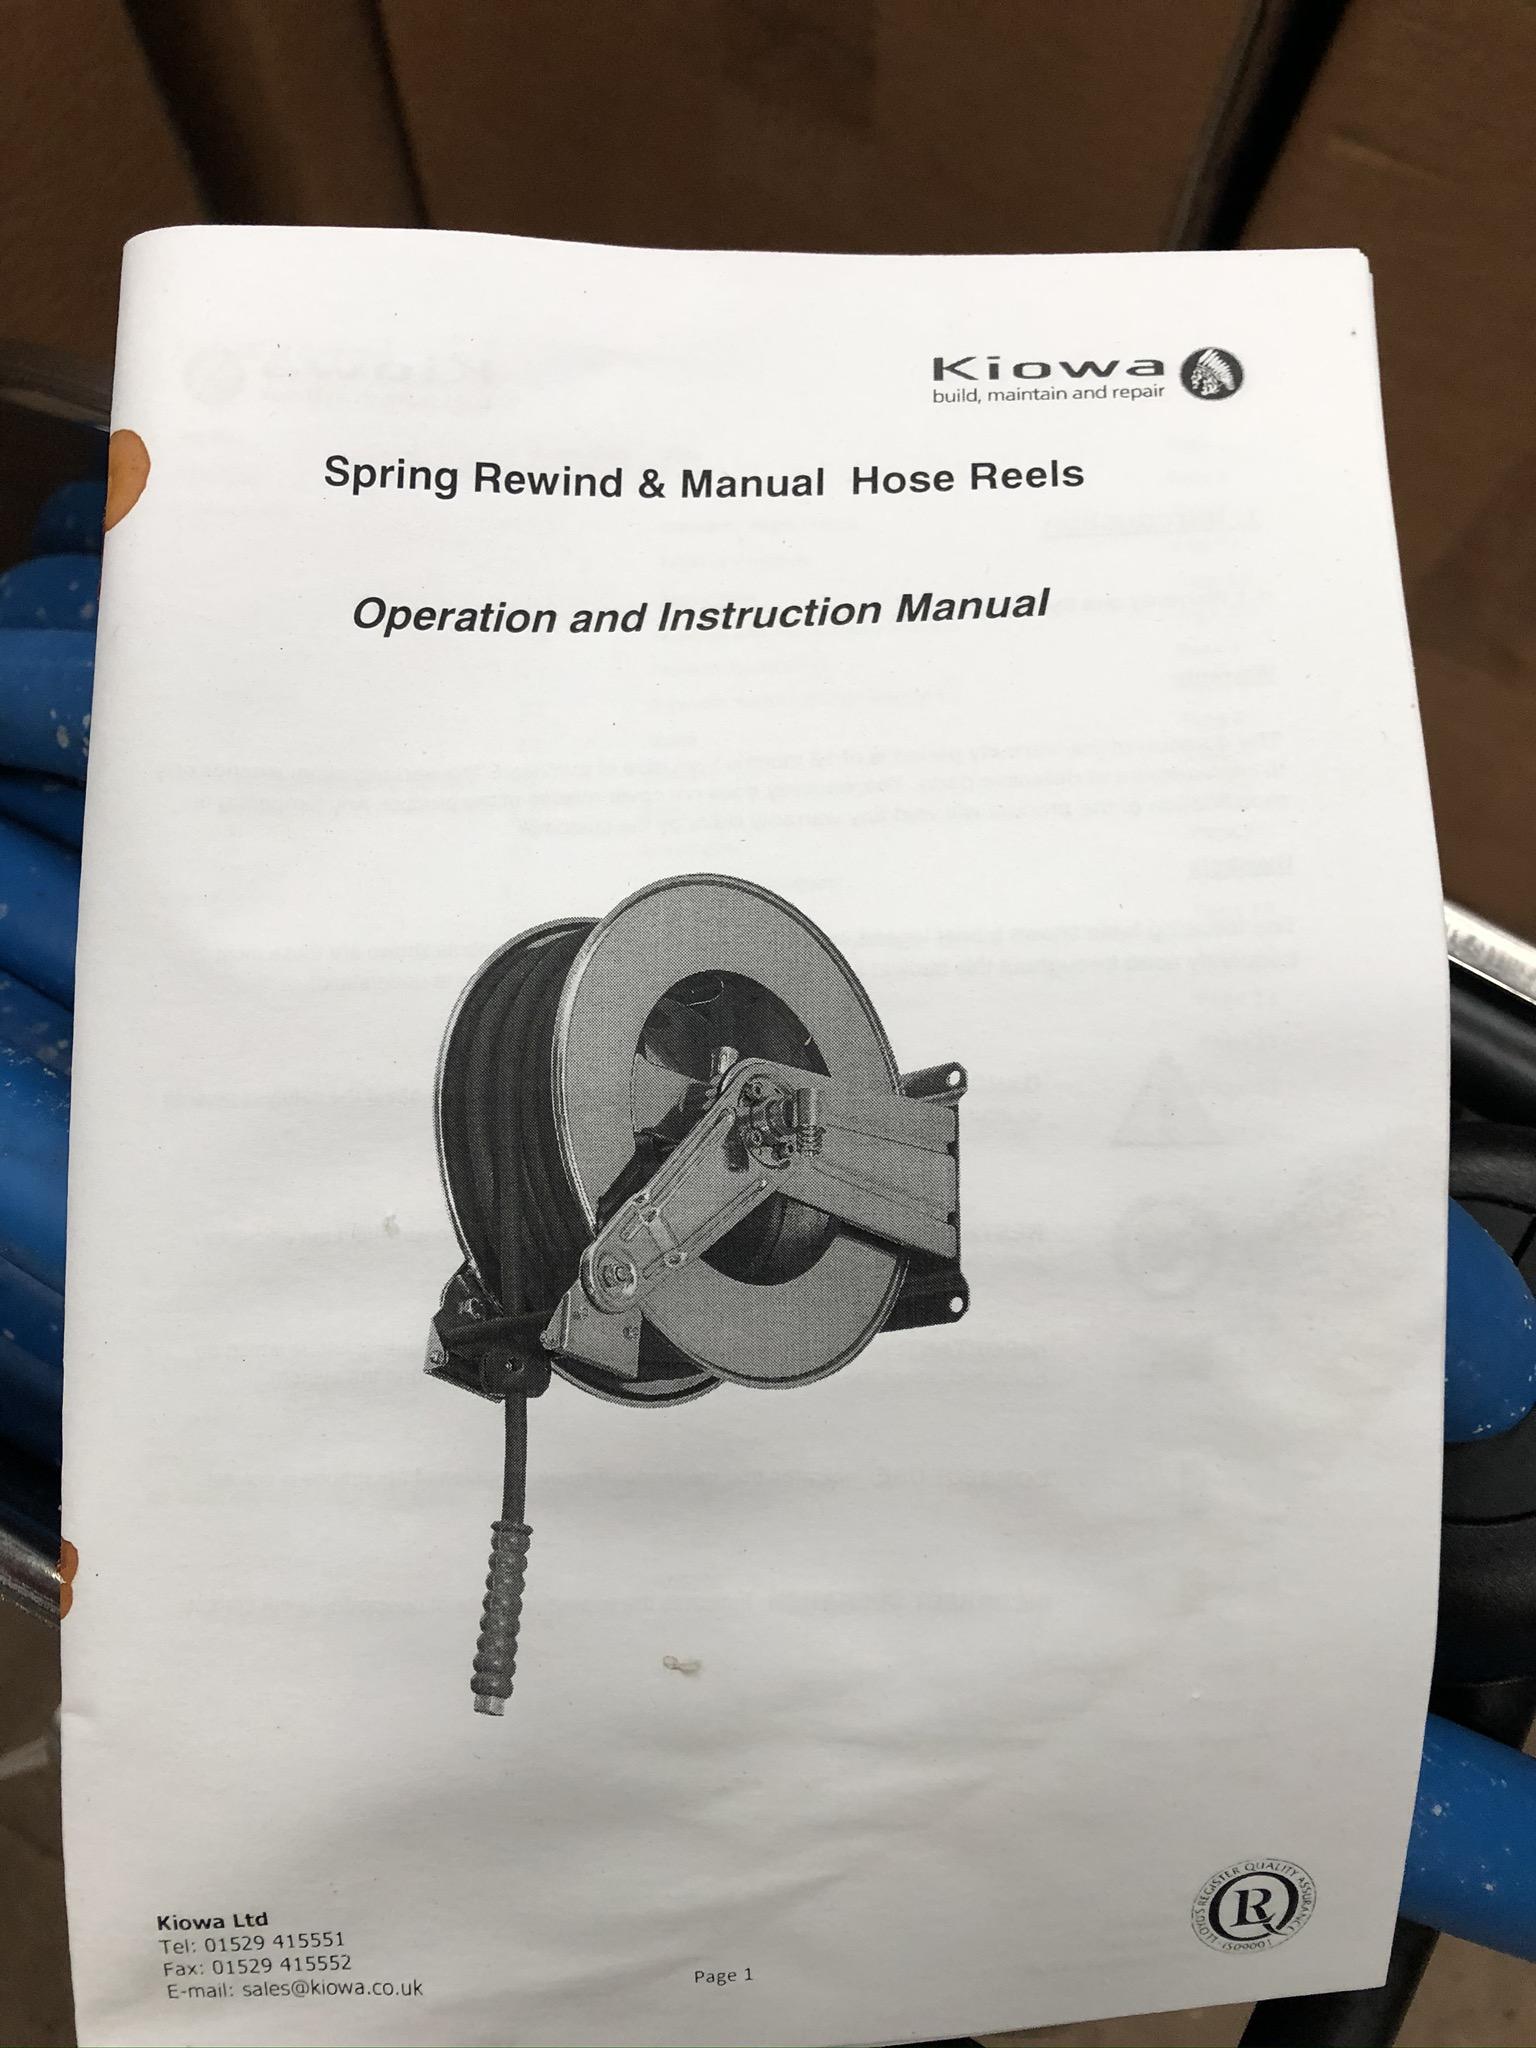 Lot 64 - Kiowa Spring Rewind & Manual Hose Reel, plant no.